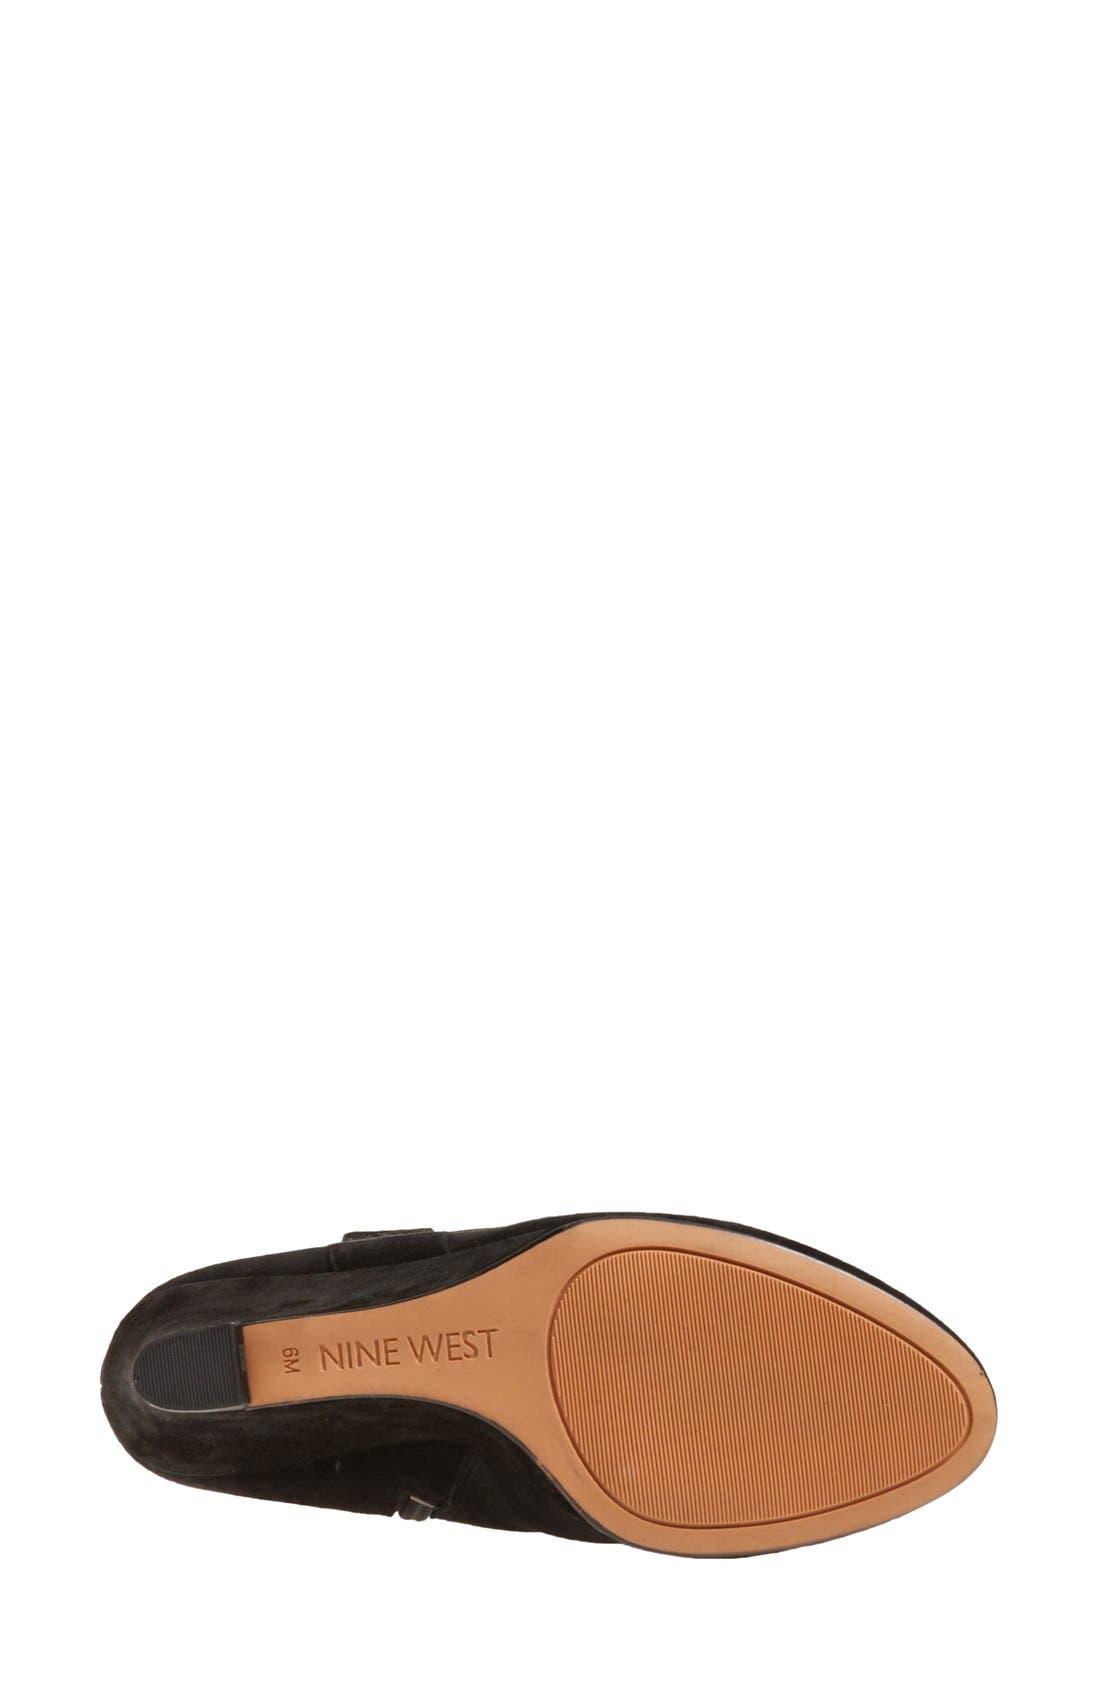 'Oran' Tall Wedge Boot,                             Alternate thumbnail 2, color,                             001